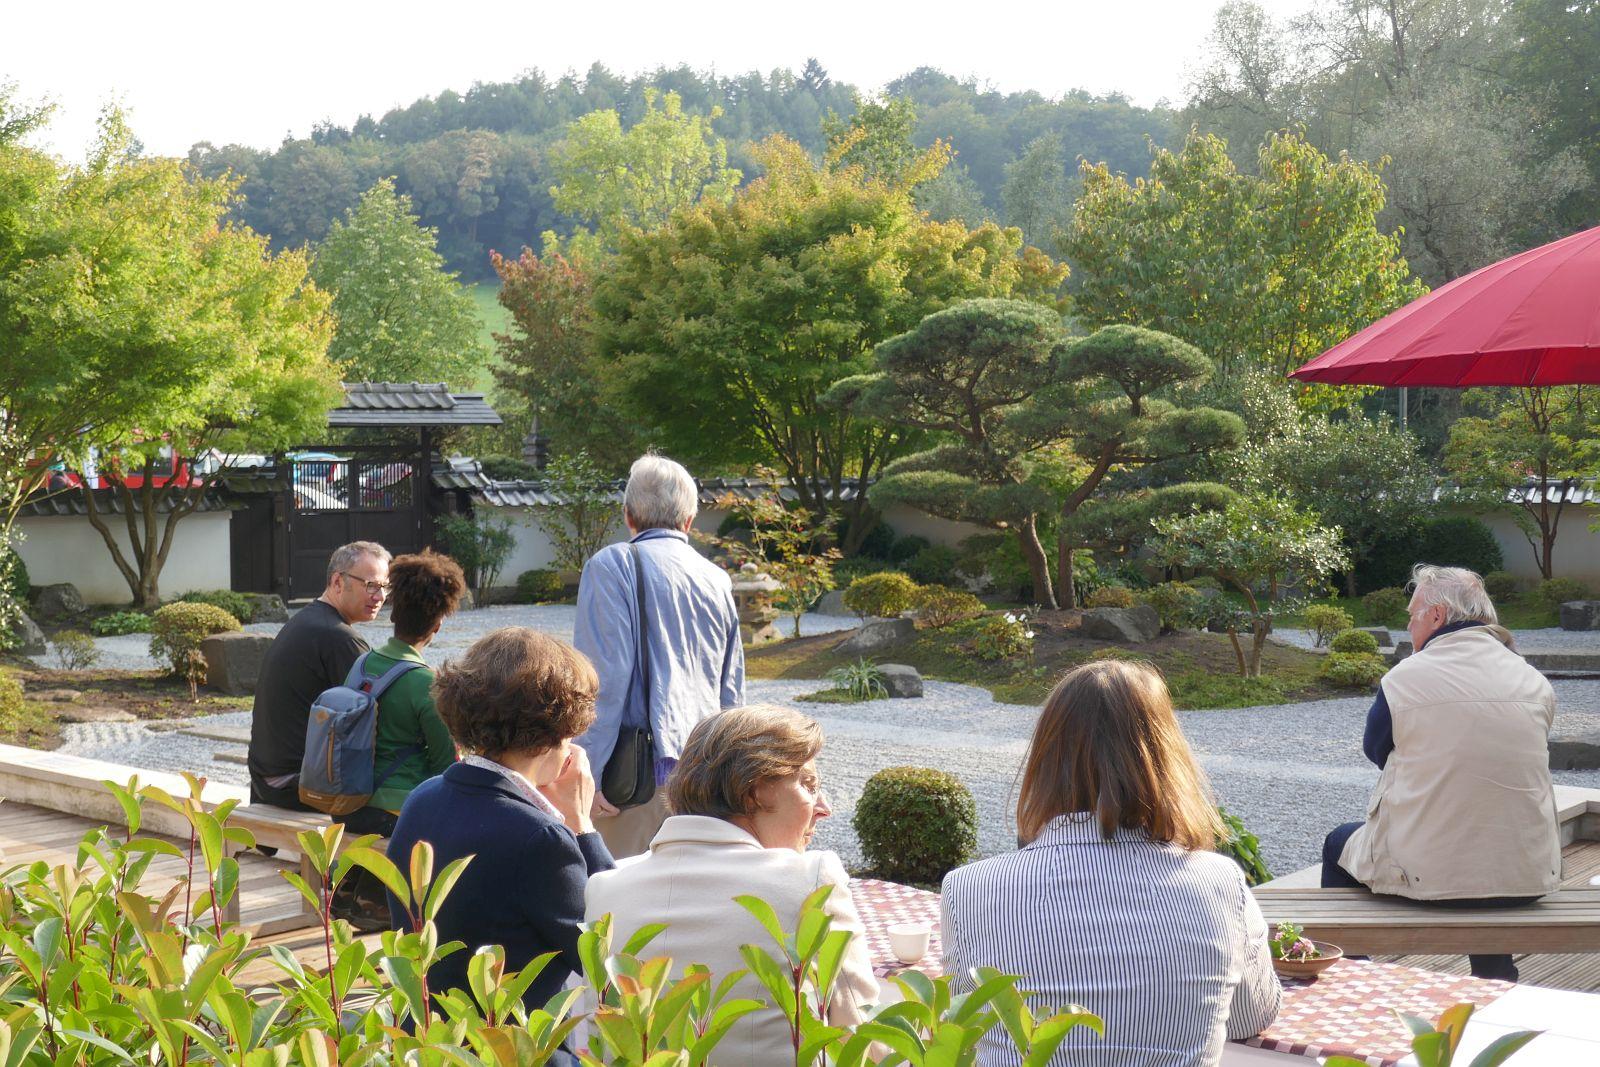 Japan tag am japanischen garten bielefeld am 14 - Japanischer garten bielefeld ...